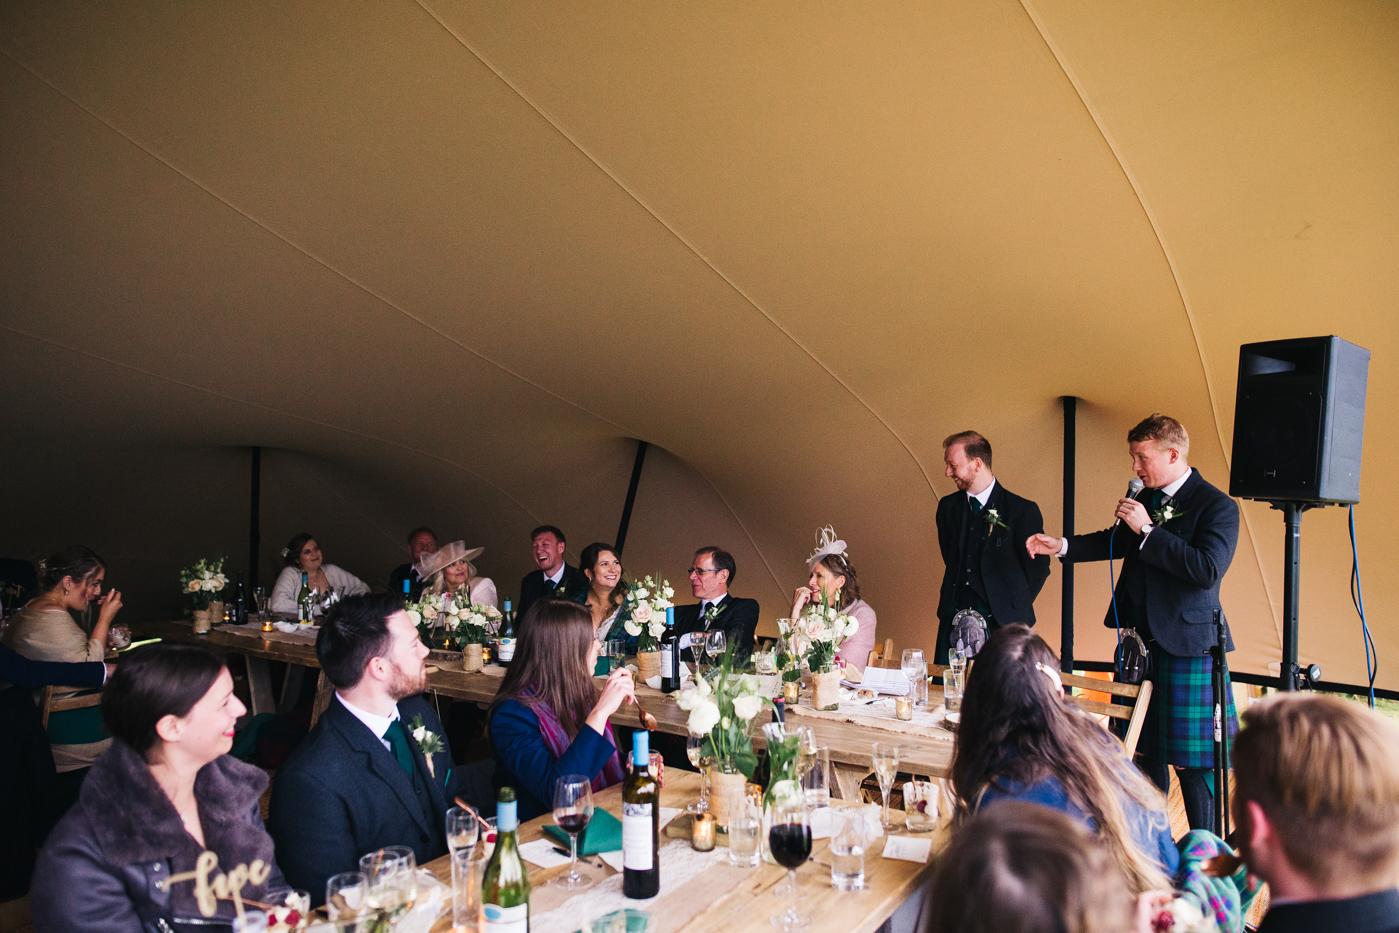 scottish-wedding-trossachs-loch-tay-highlannds-relaxed-photography-photographer-0045.jpg